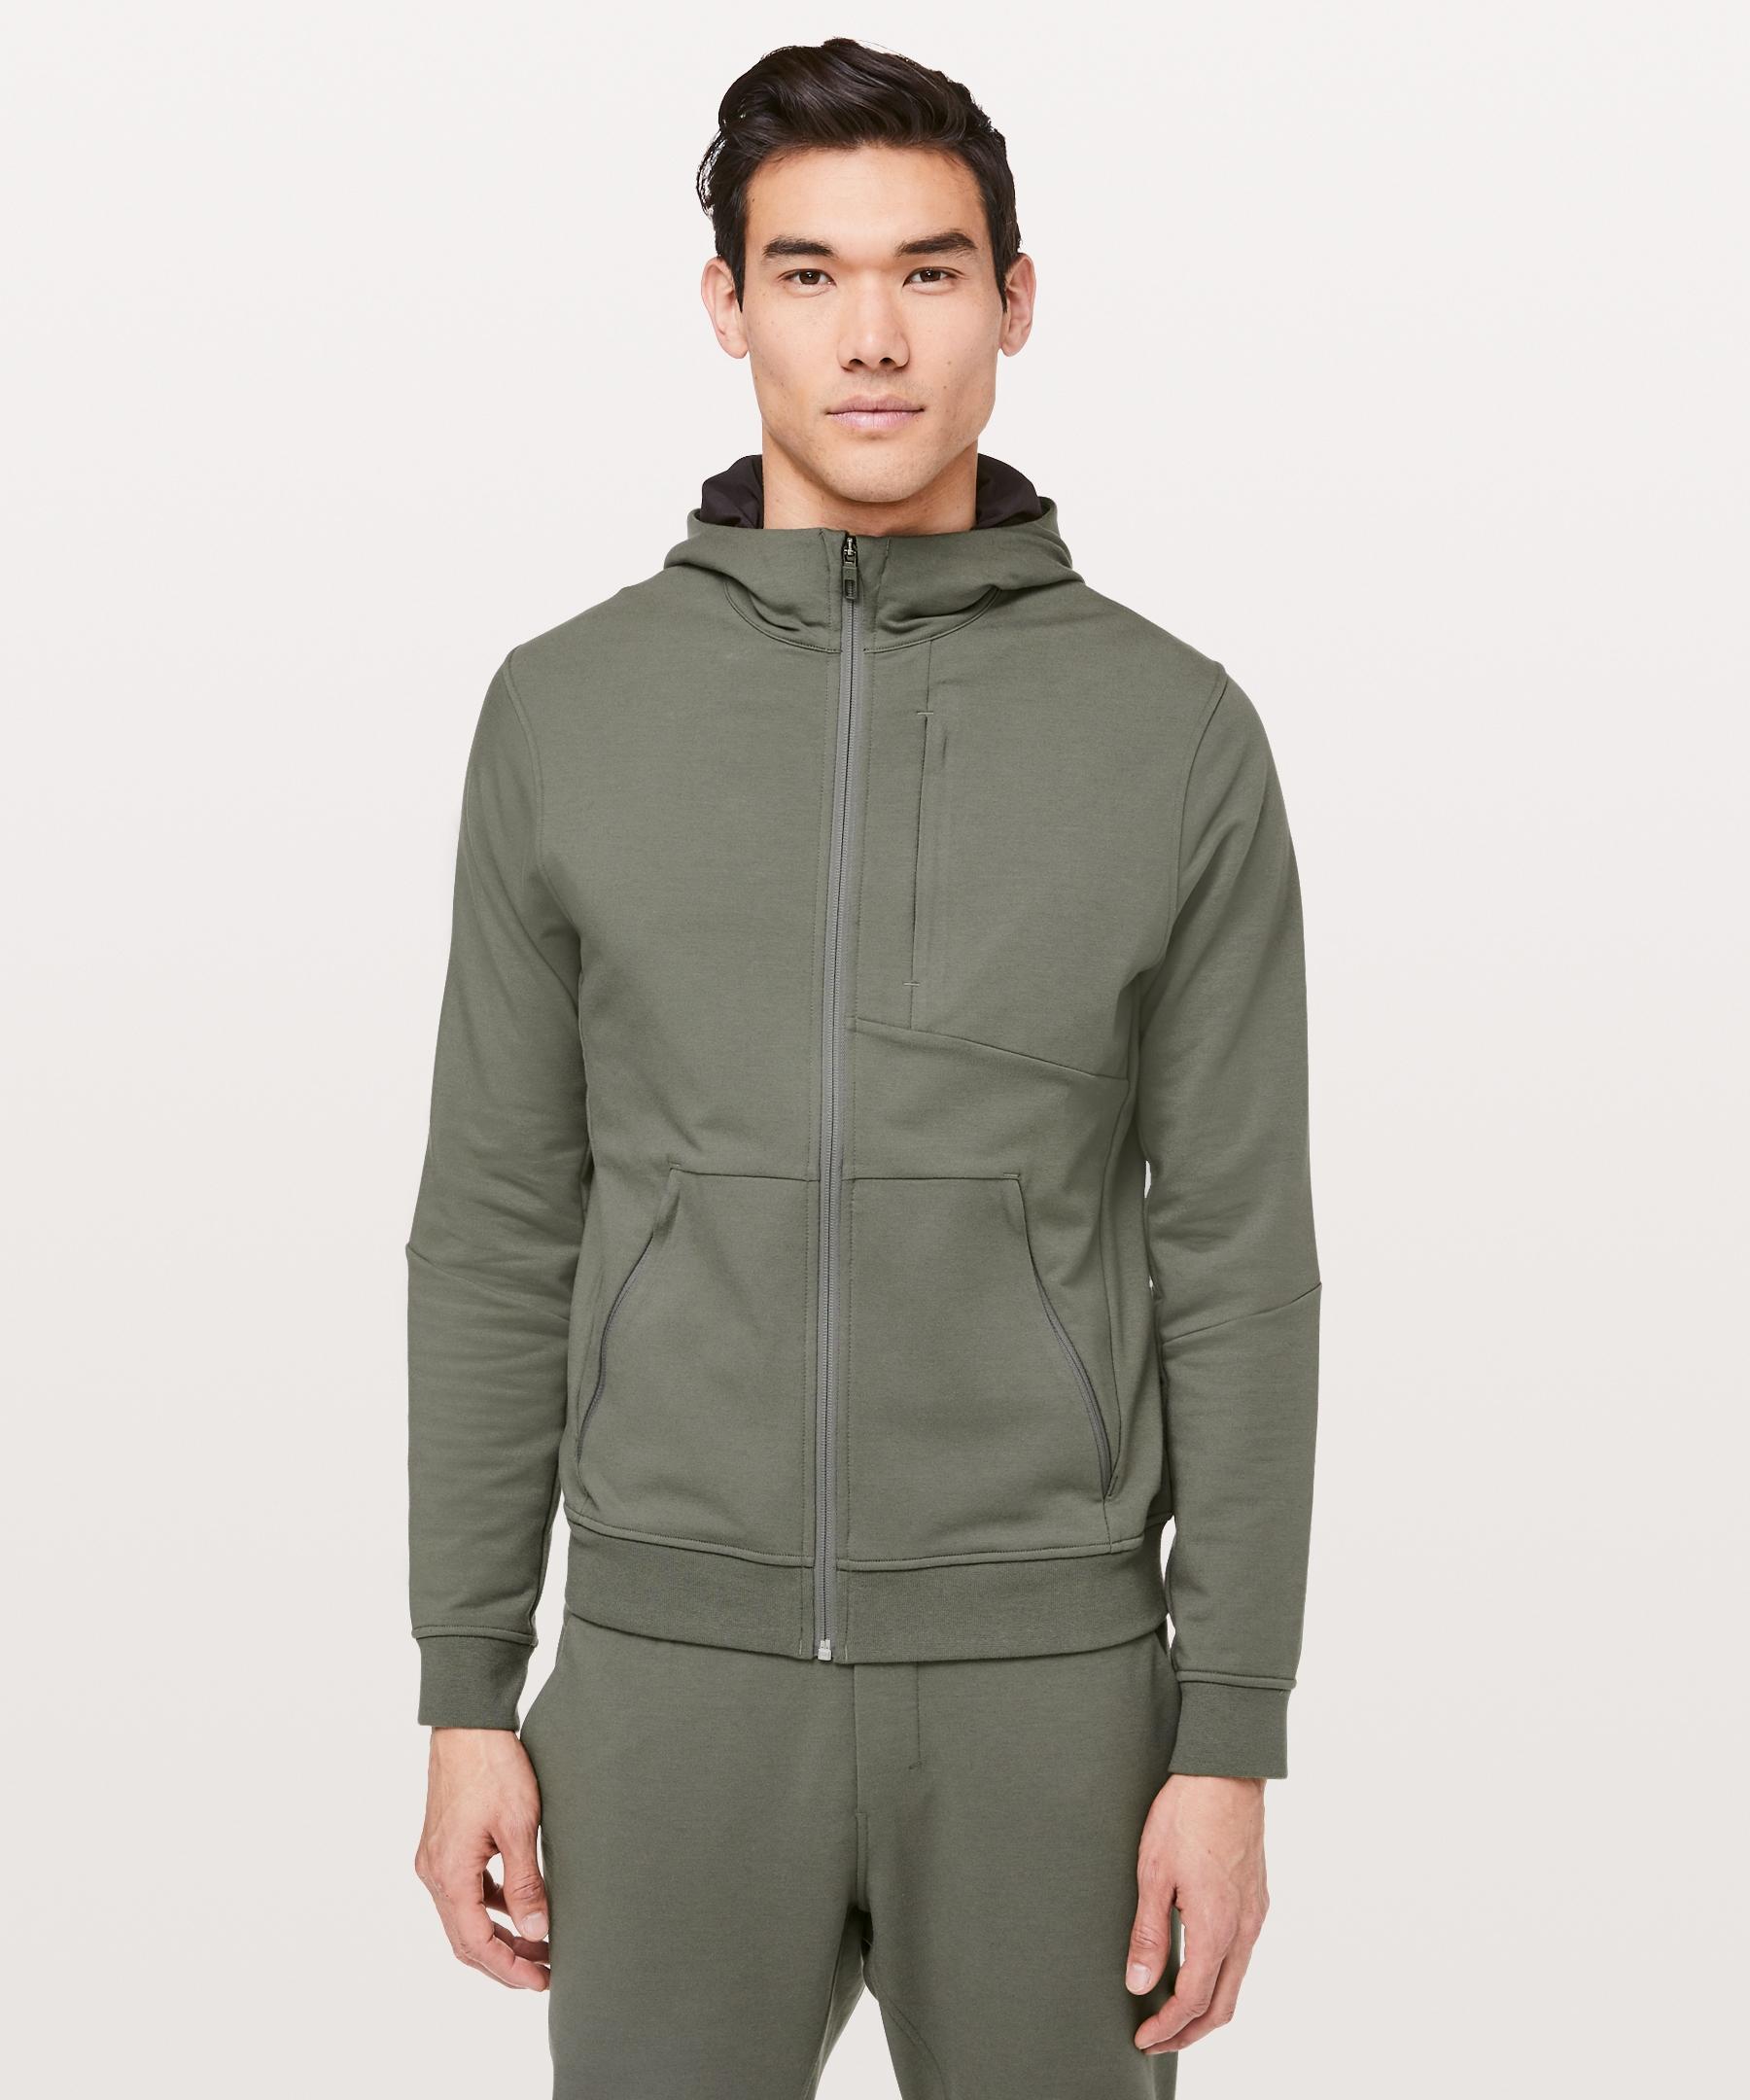 Lululemon Men S City Sweat Zip Hoodie Grey Sage Size Xs Mens Sweatshirts Hoodie Mens Workout Clothes Hoodies Men